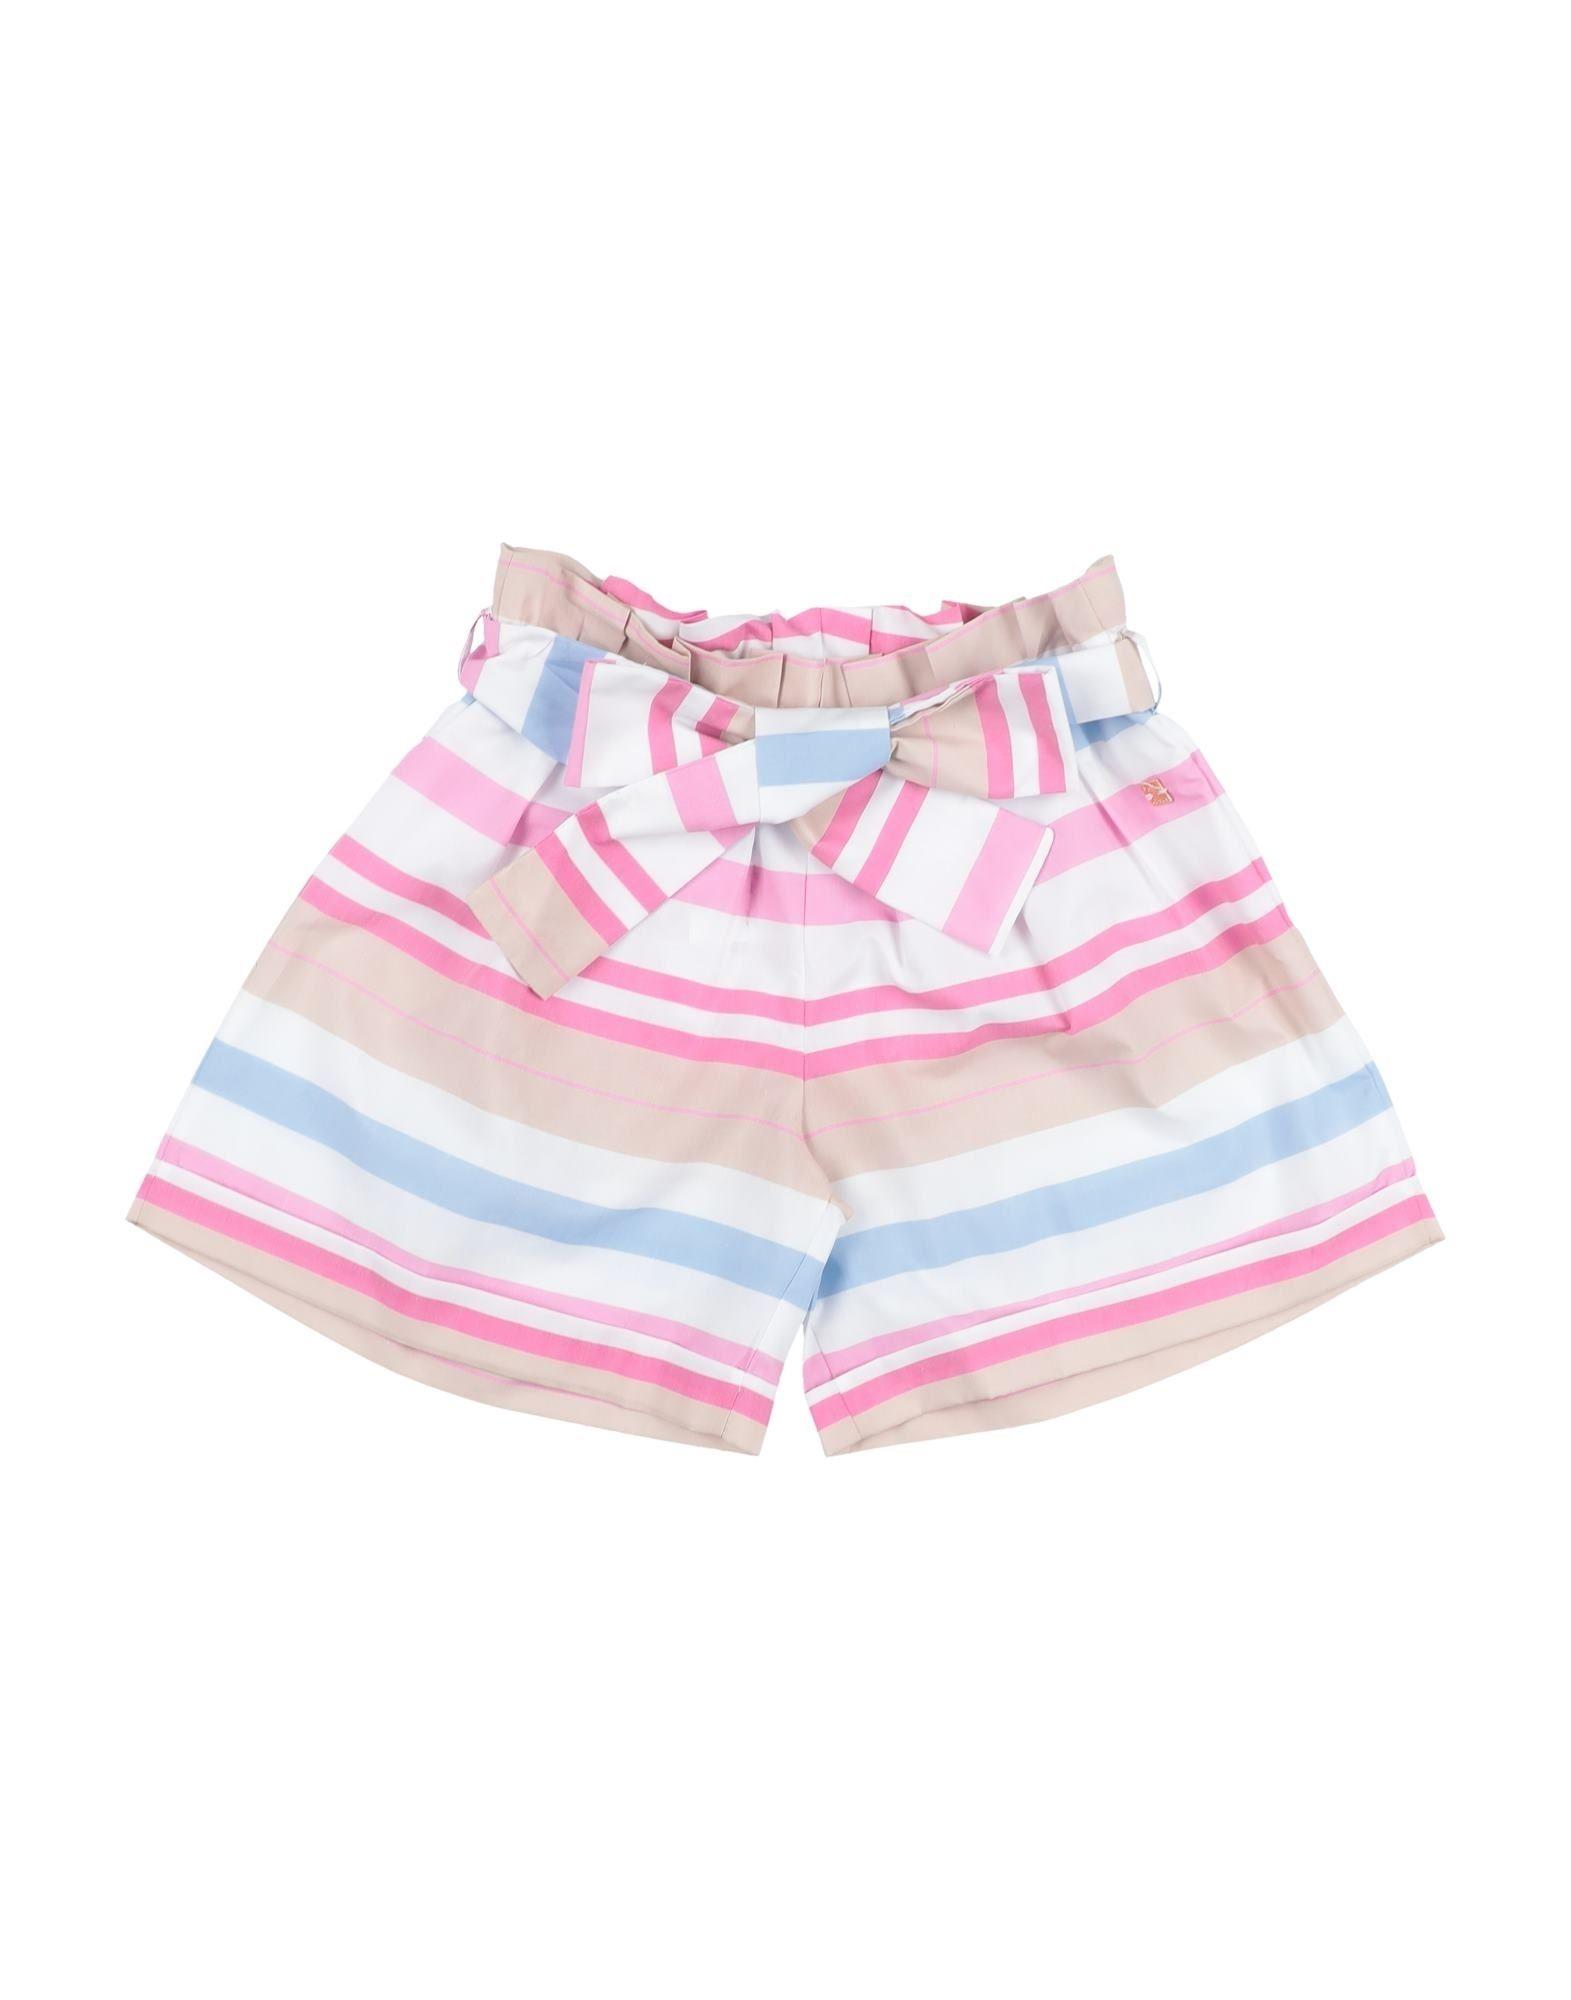 Manila Grace Kids' Shorts In Fuchsia